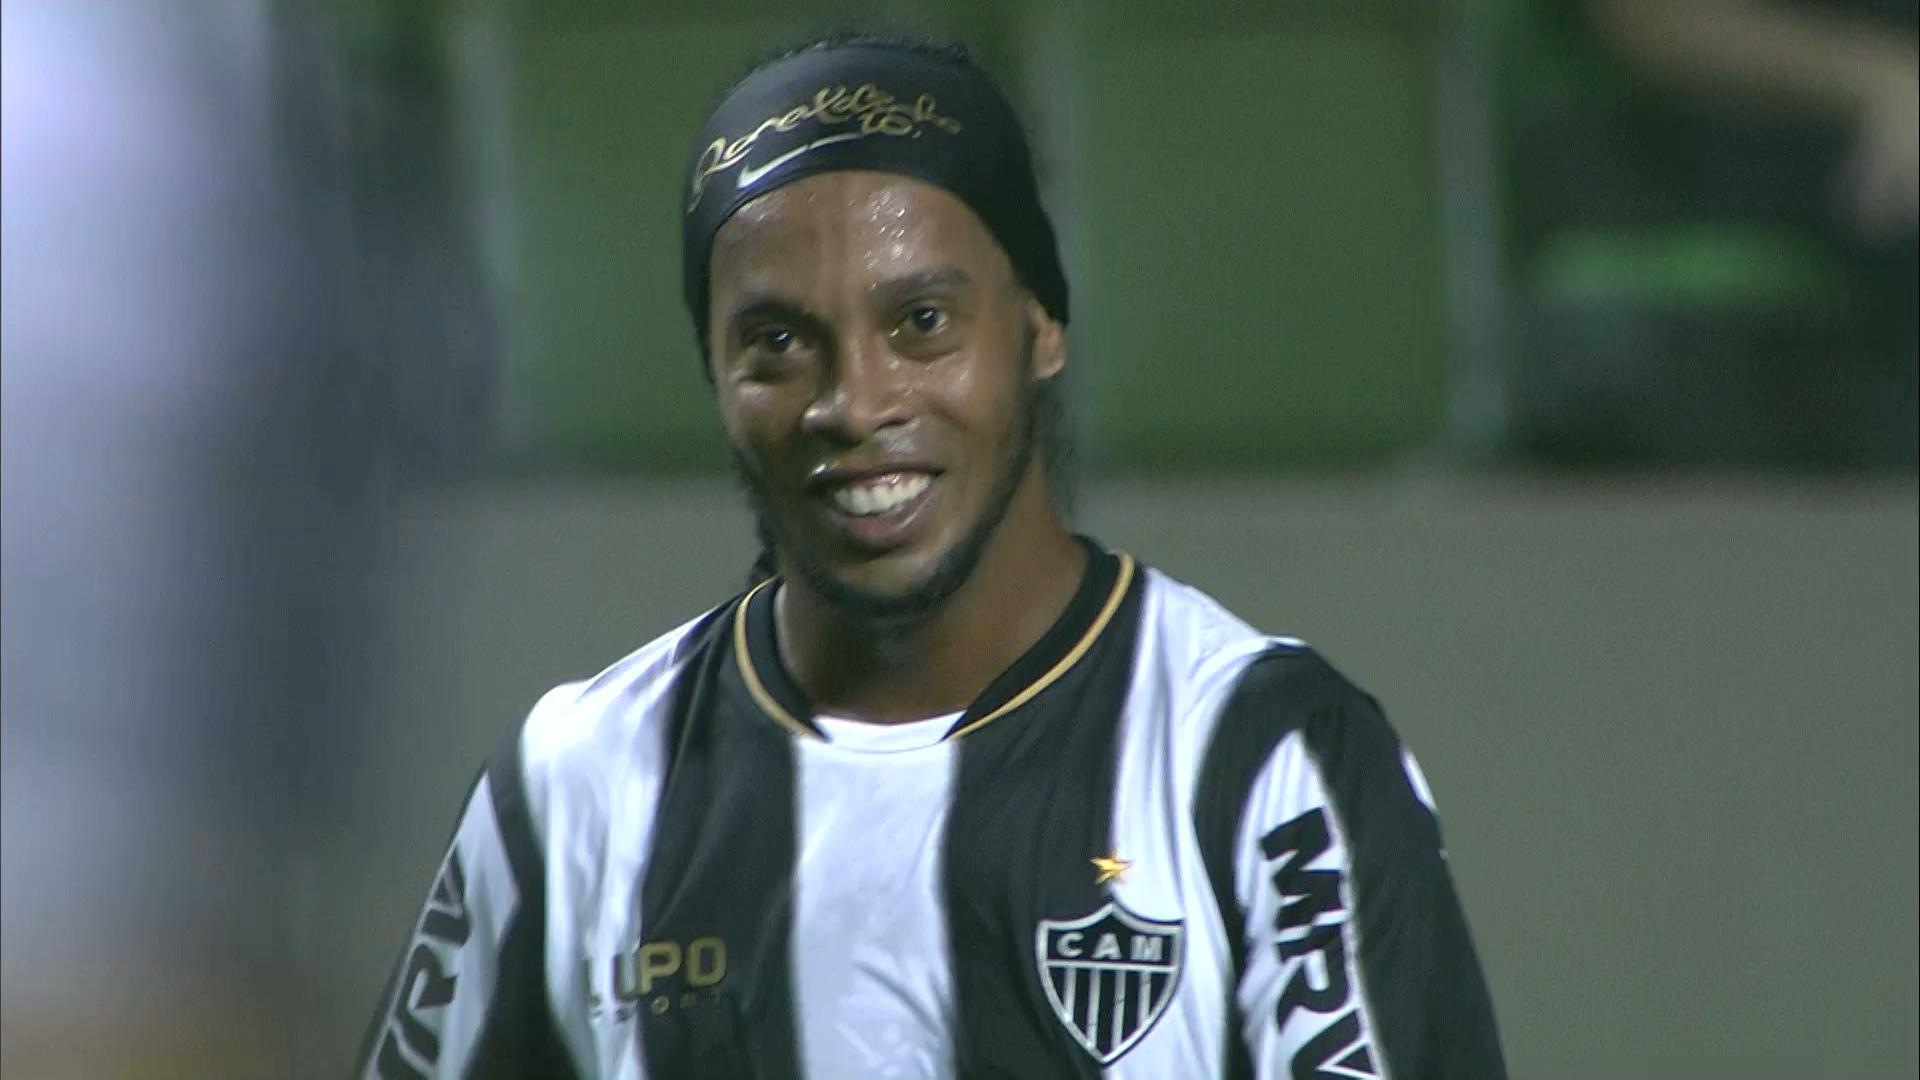 R Gleidson Fonseca Soares